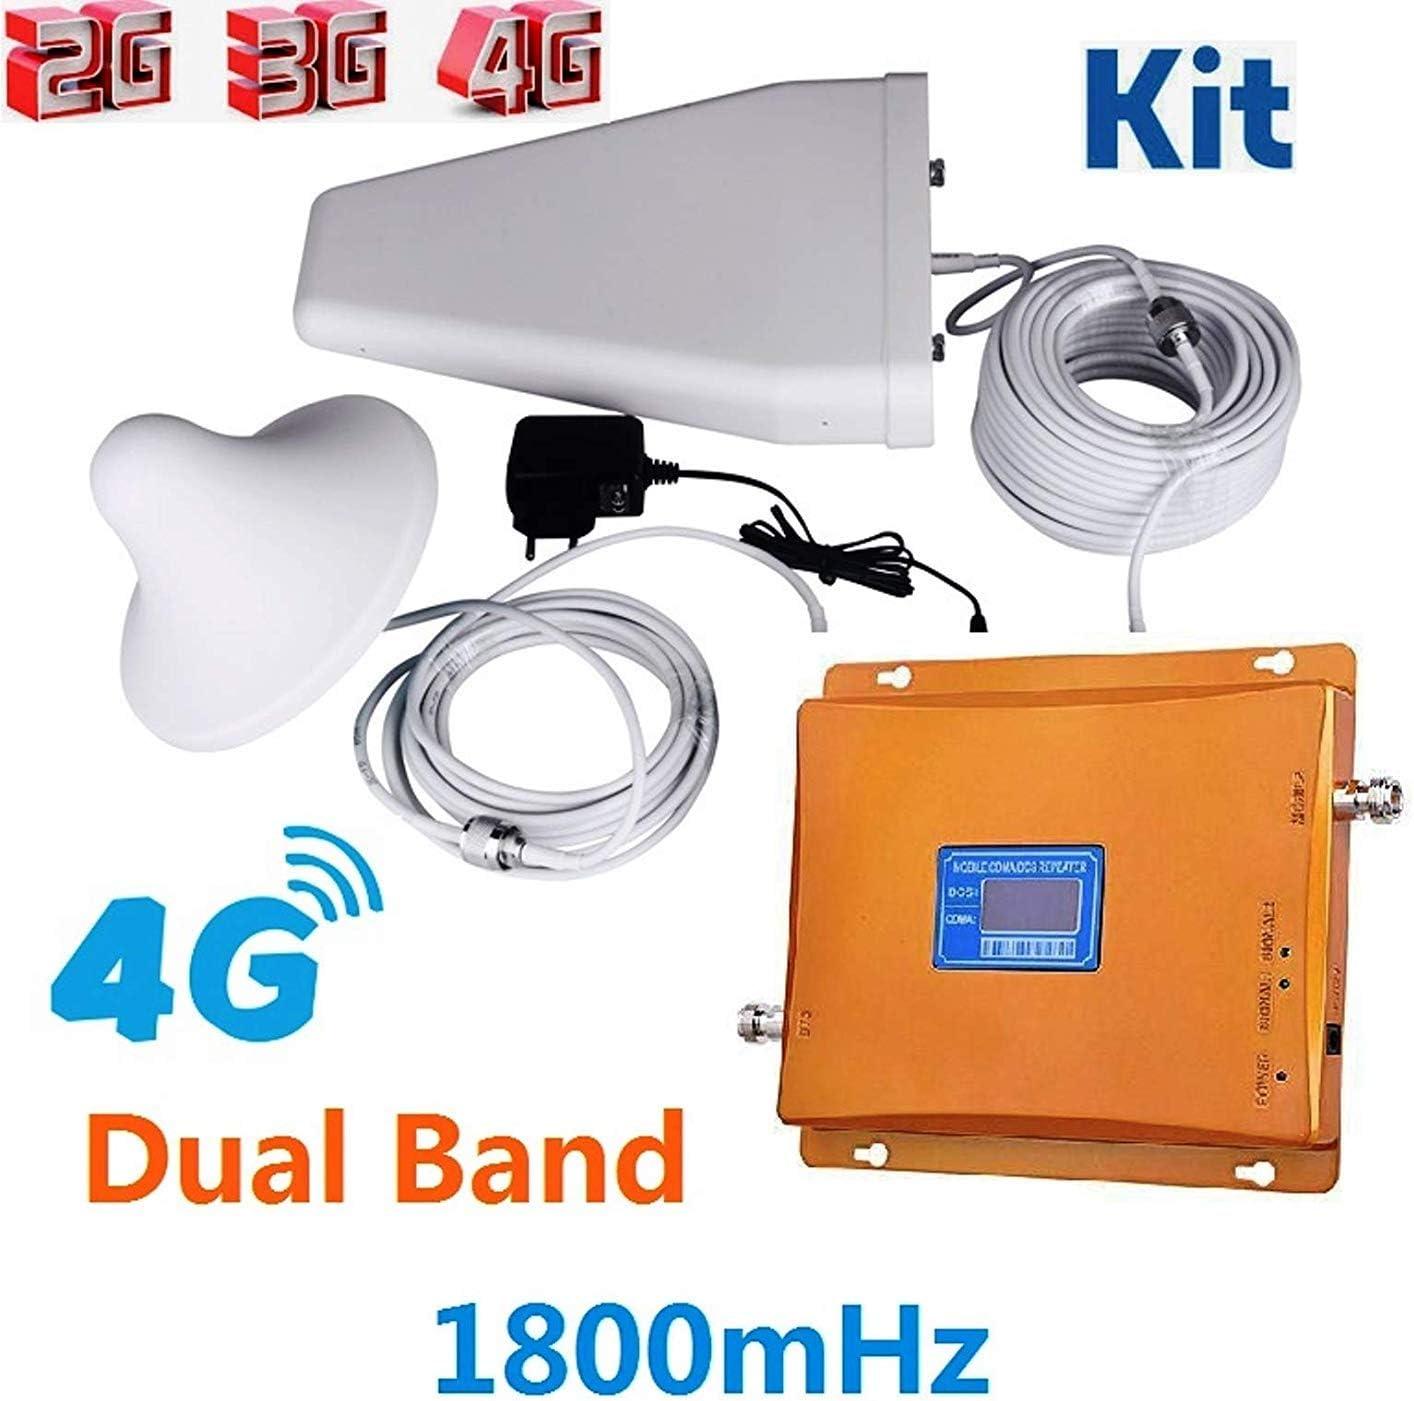 puntoluceled Ripetitore Kit 1800MHz Amplificatore Segnale gsm LTE UMTS con Display CDMA 2G 3G 4G Amplificatore per Cellulare